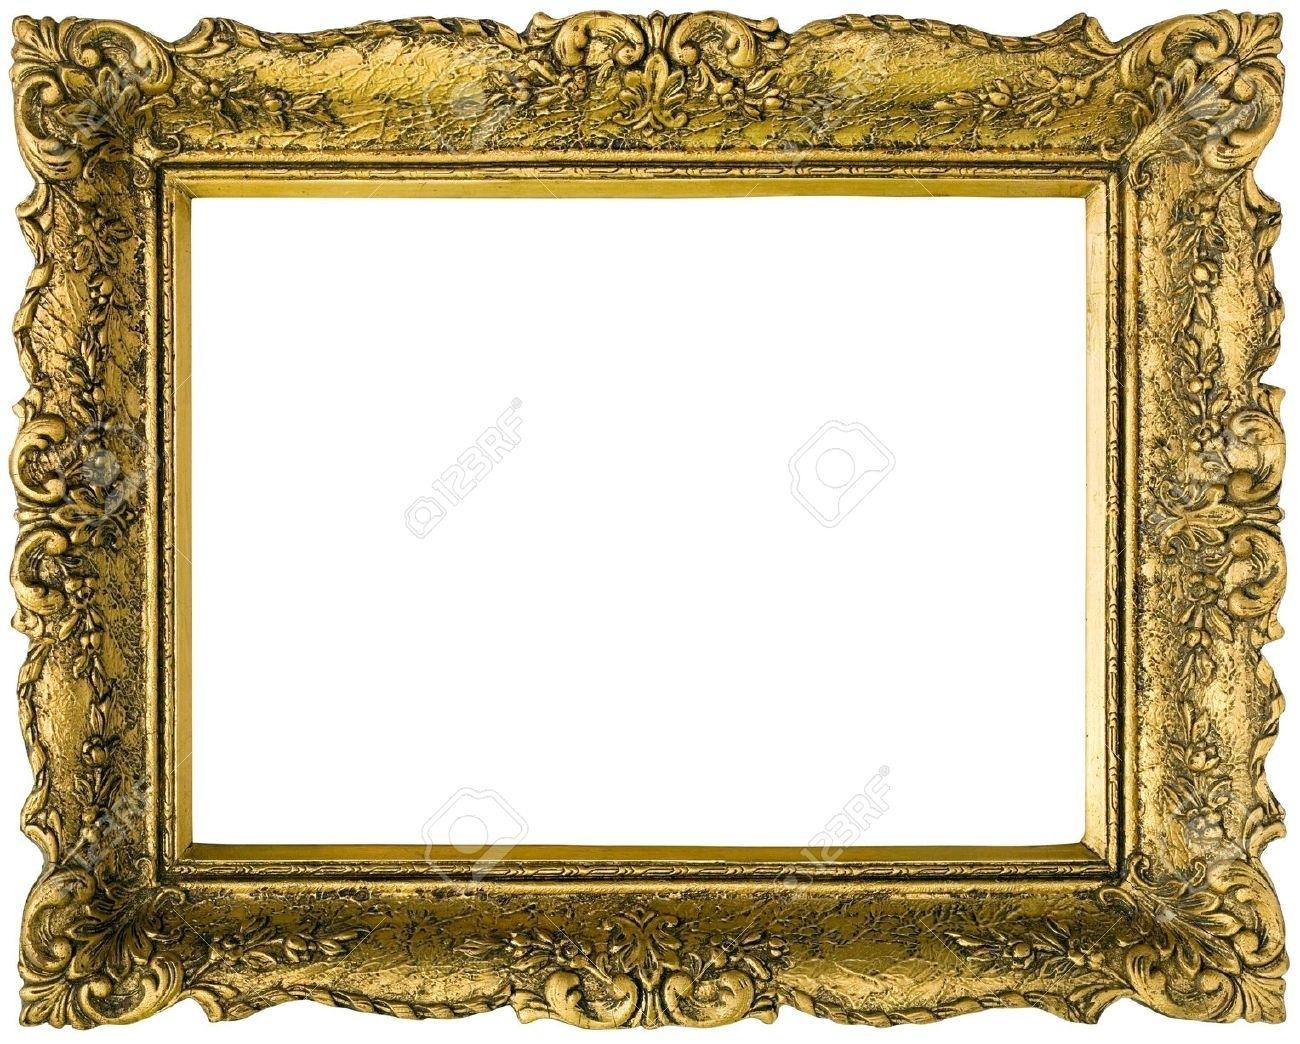 Antique Gold Leaf Frame Wall Mirror Antique Gold Leaf Frame Wall Mirror bois sculpt armature de miroir feuille dor antique cadre miroir 1300 X 1044